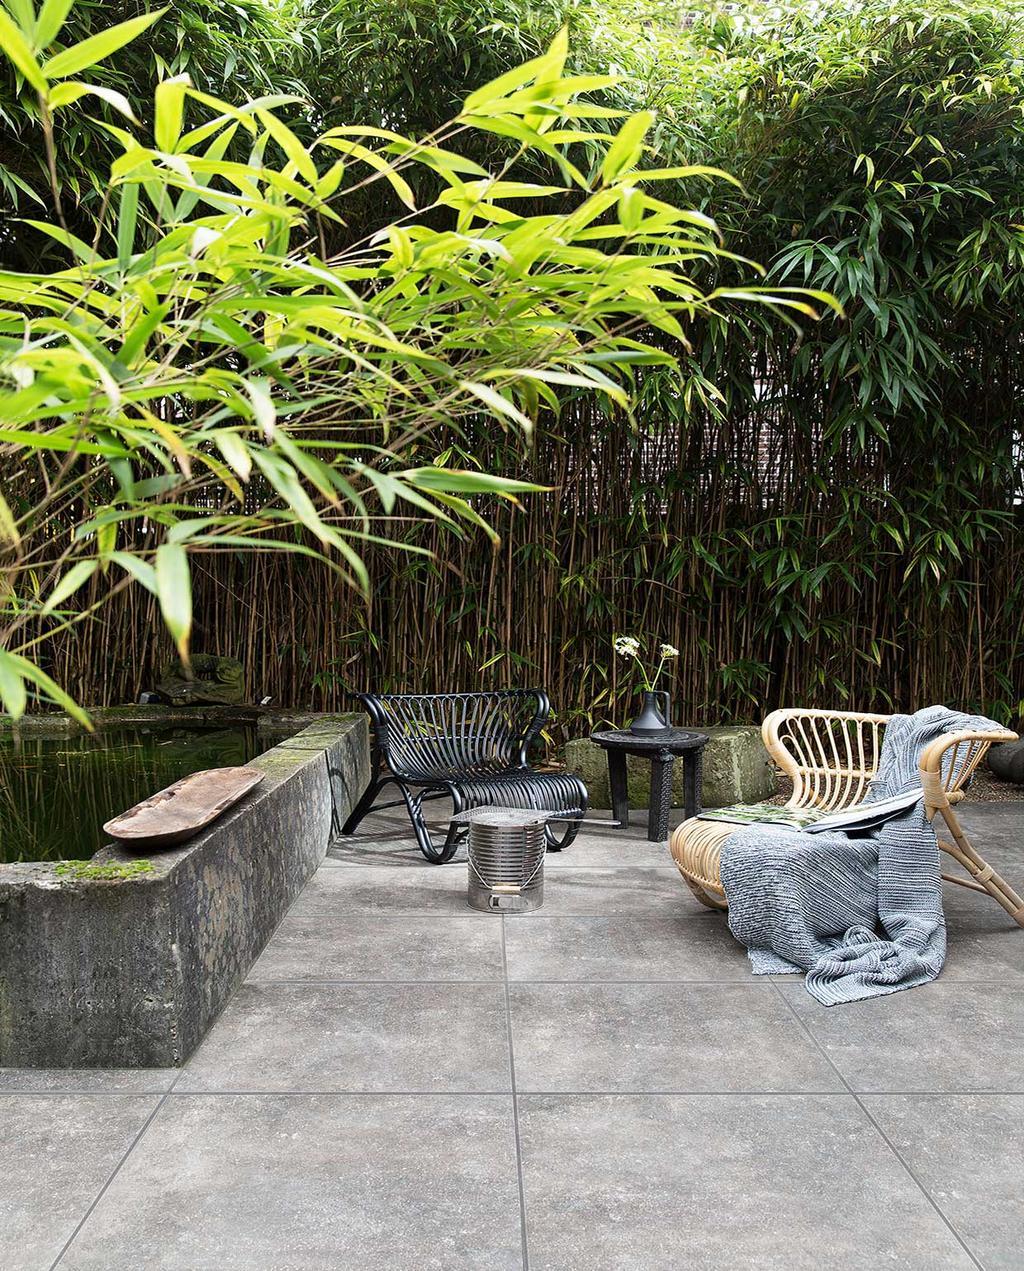 bamboe-schutting-erfafscheiding-tuinstoelen-tuin-riet-rotan-vtwonen